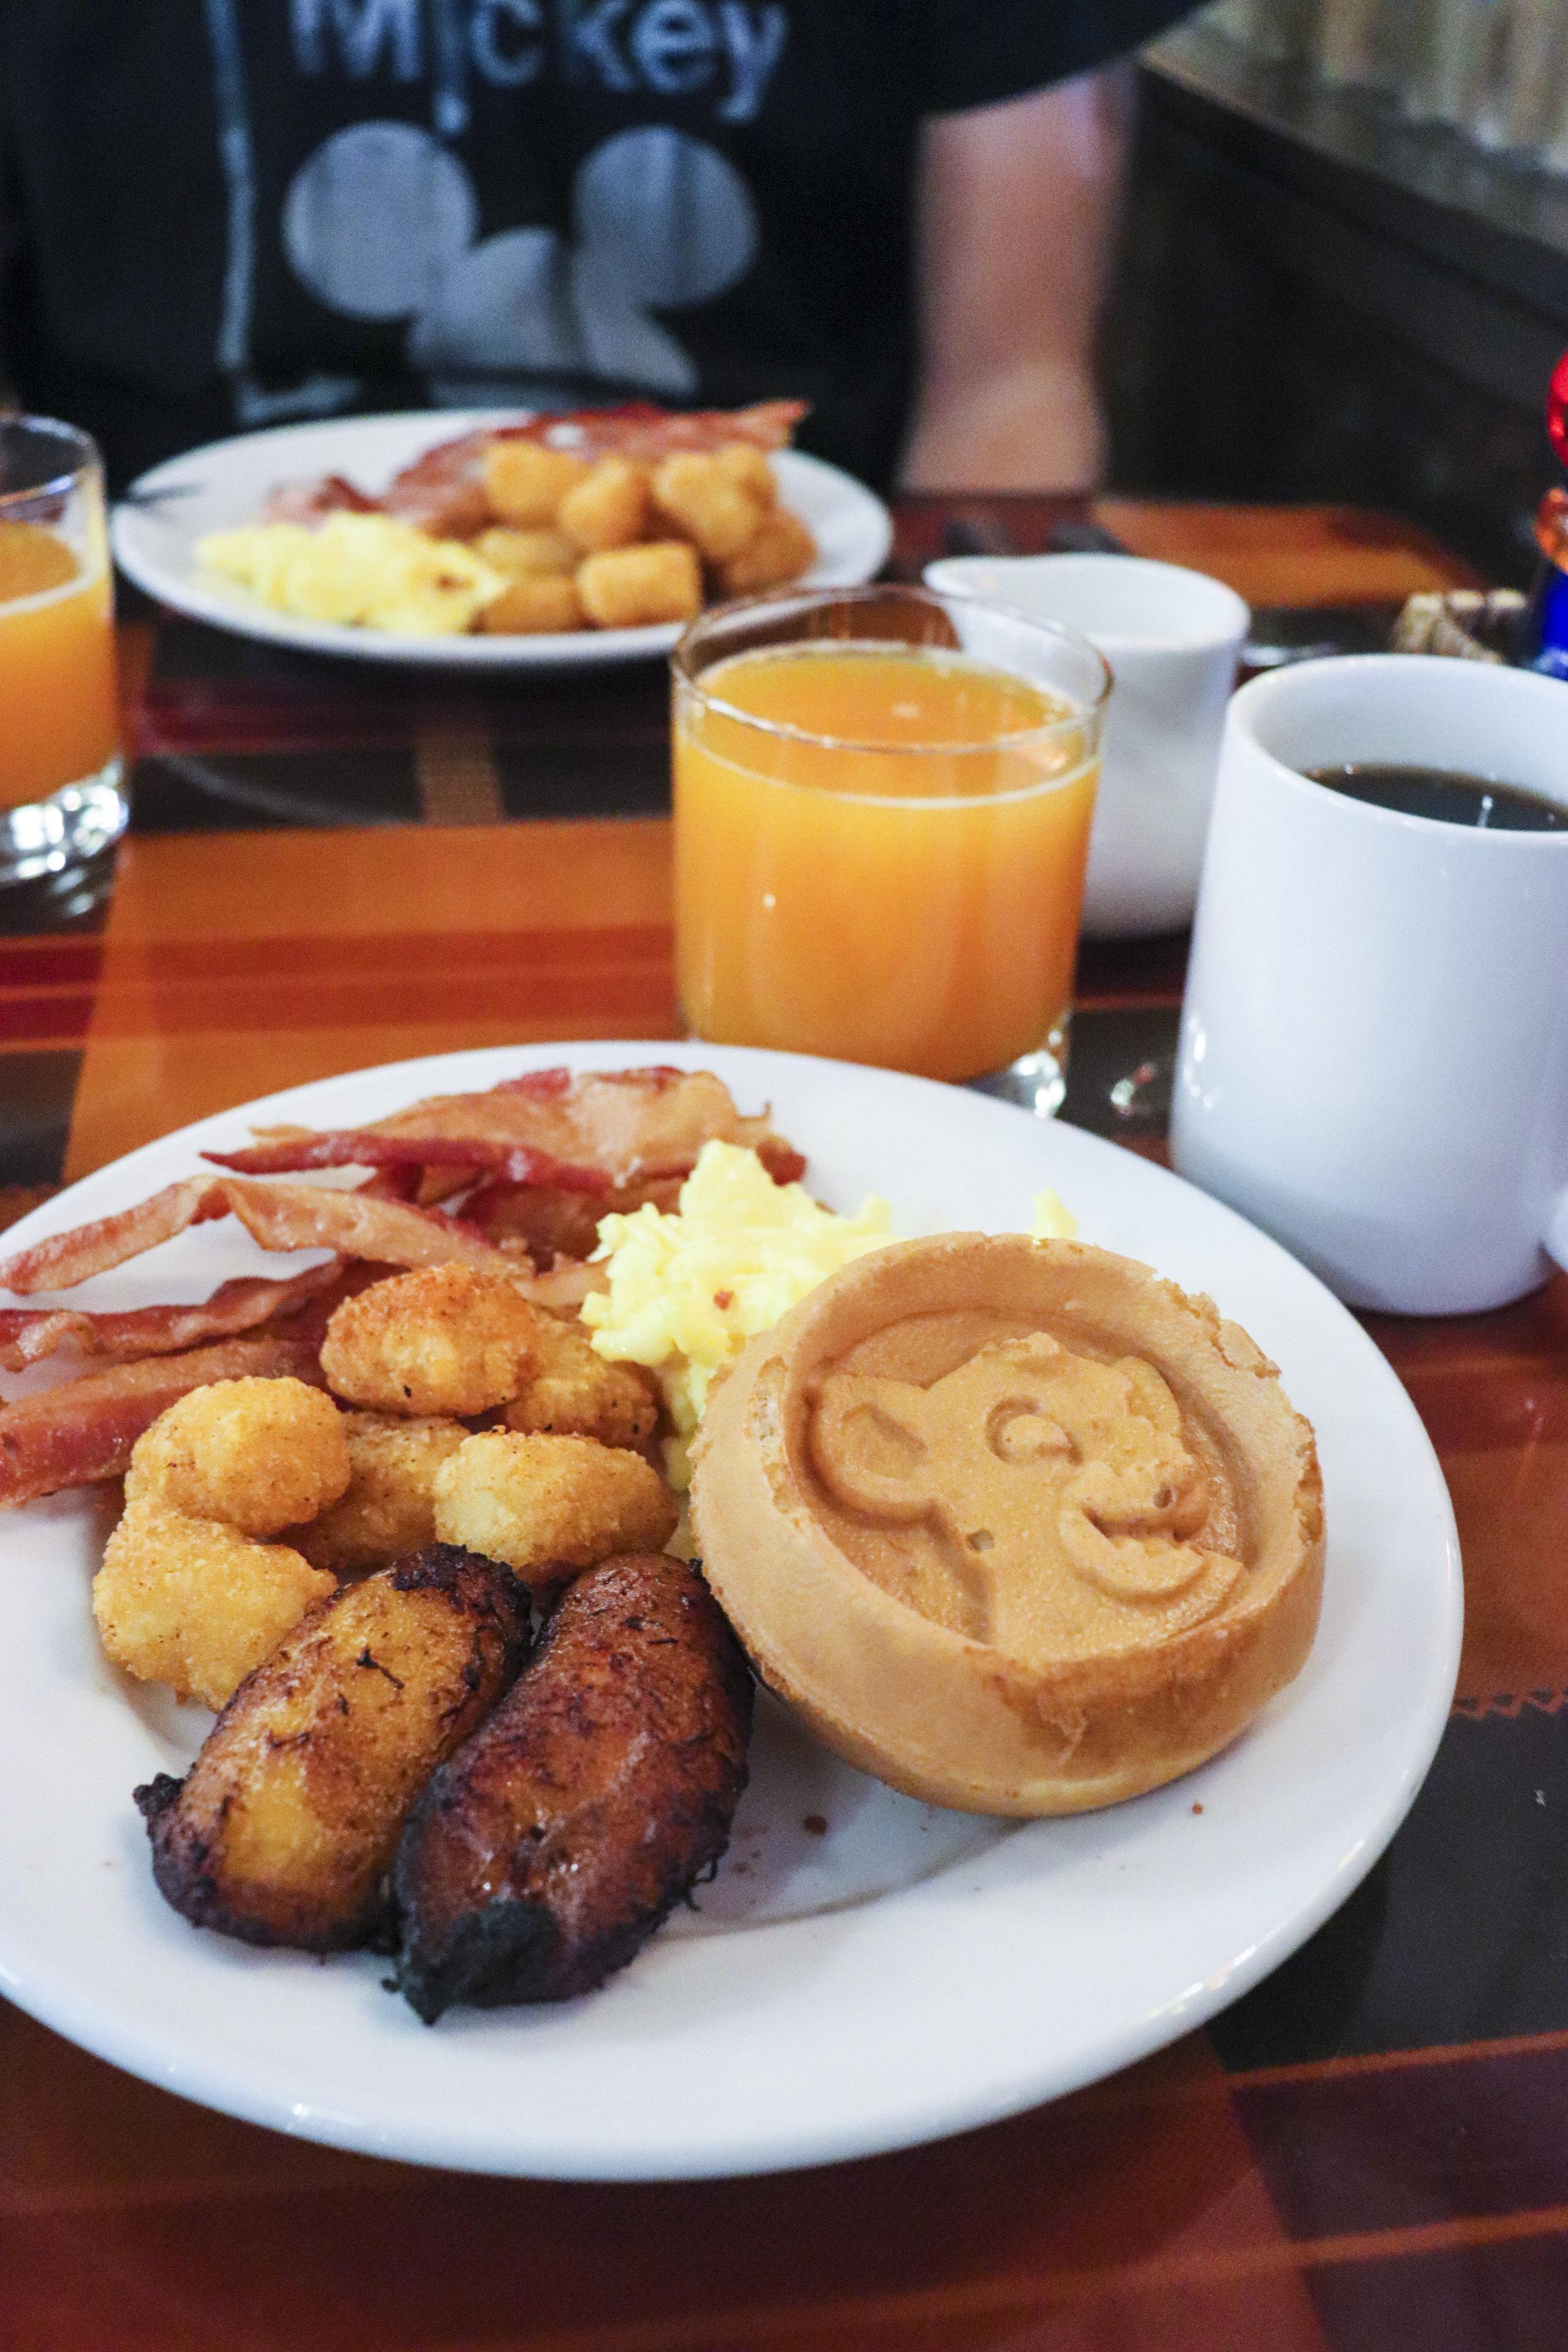 Check out that Simba waffle!